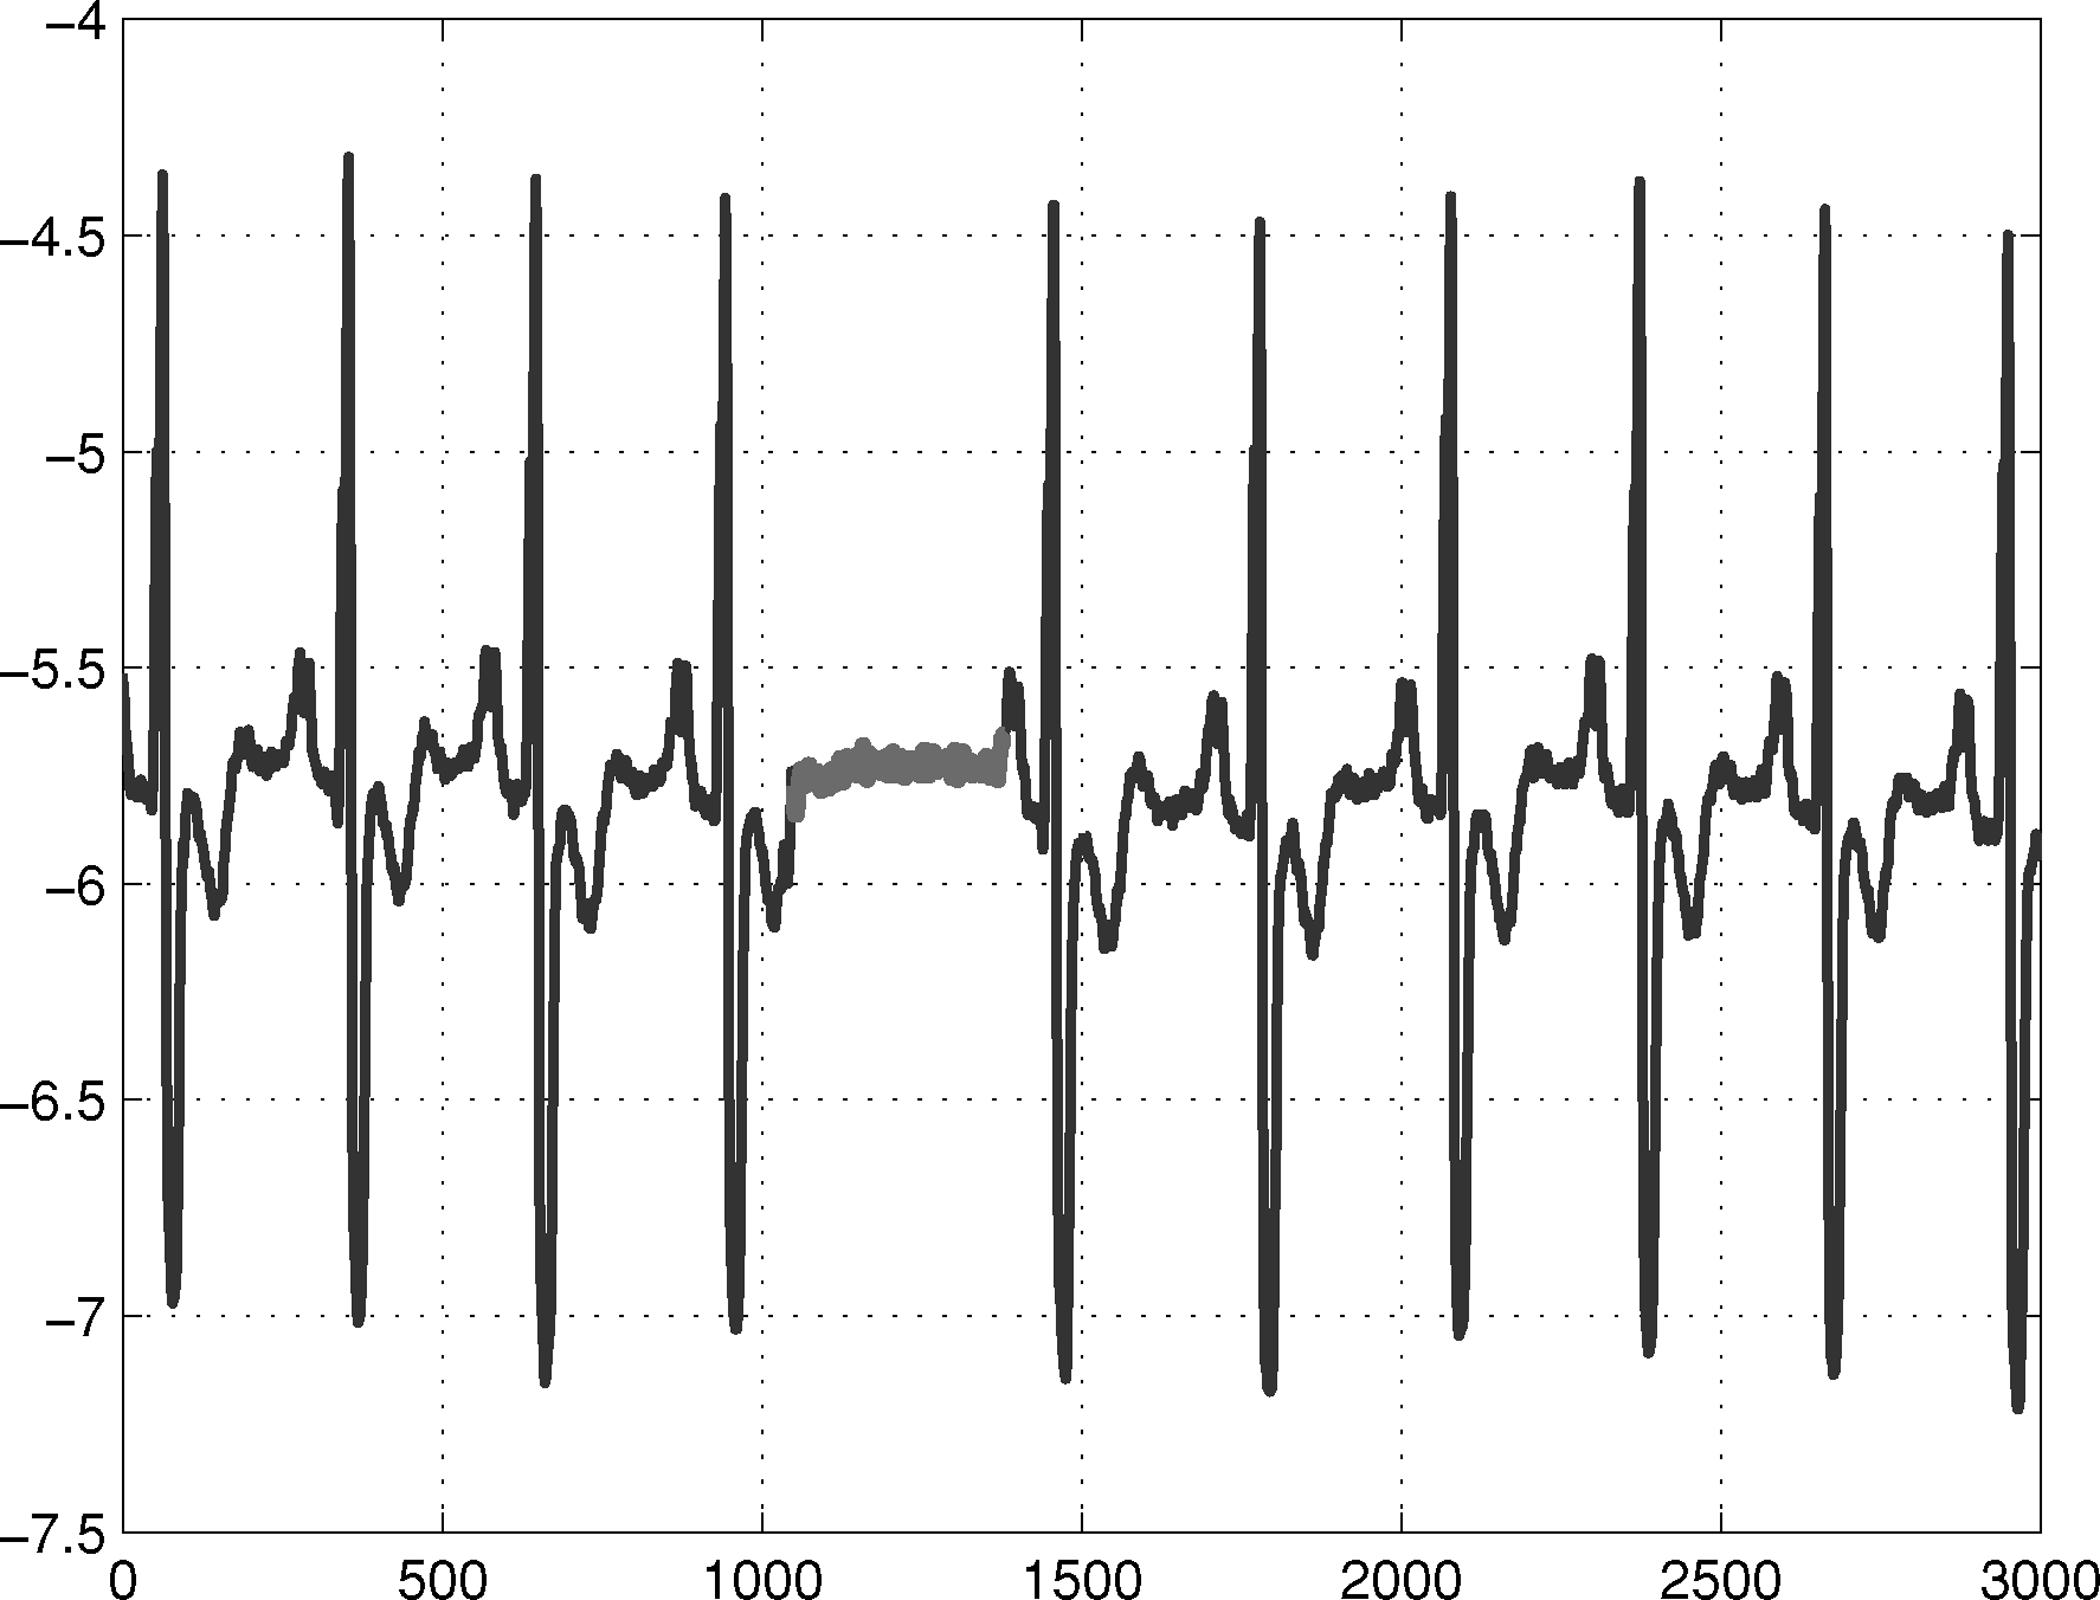 Kollektive Anomalie des Elektrokardiogramms